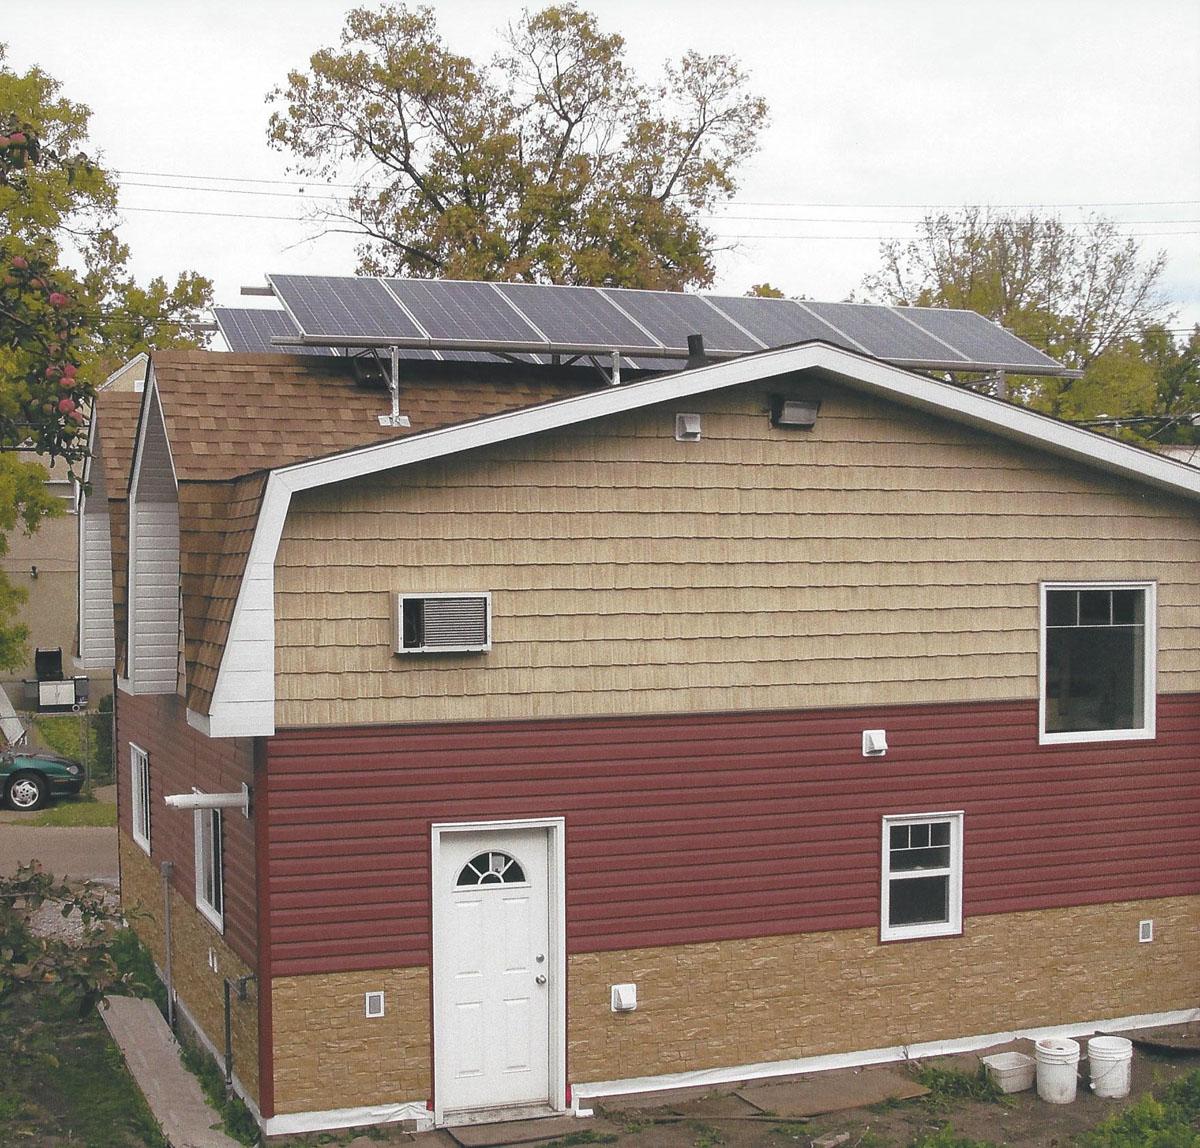 Solar Panel Rooftop System Alberta Canada